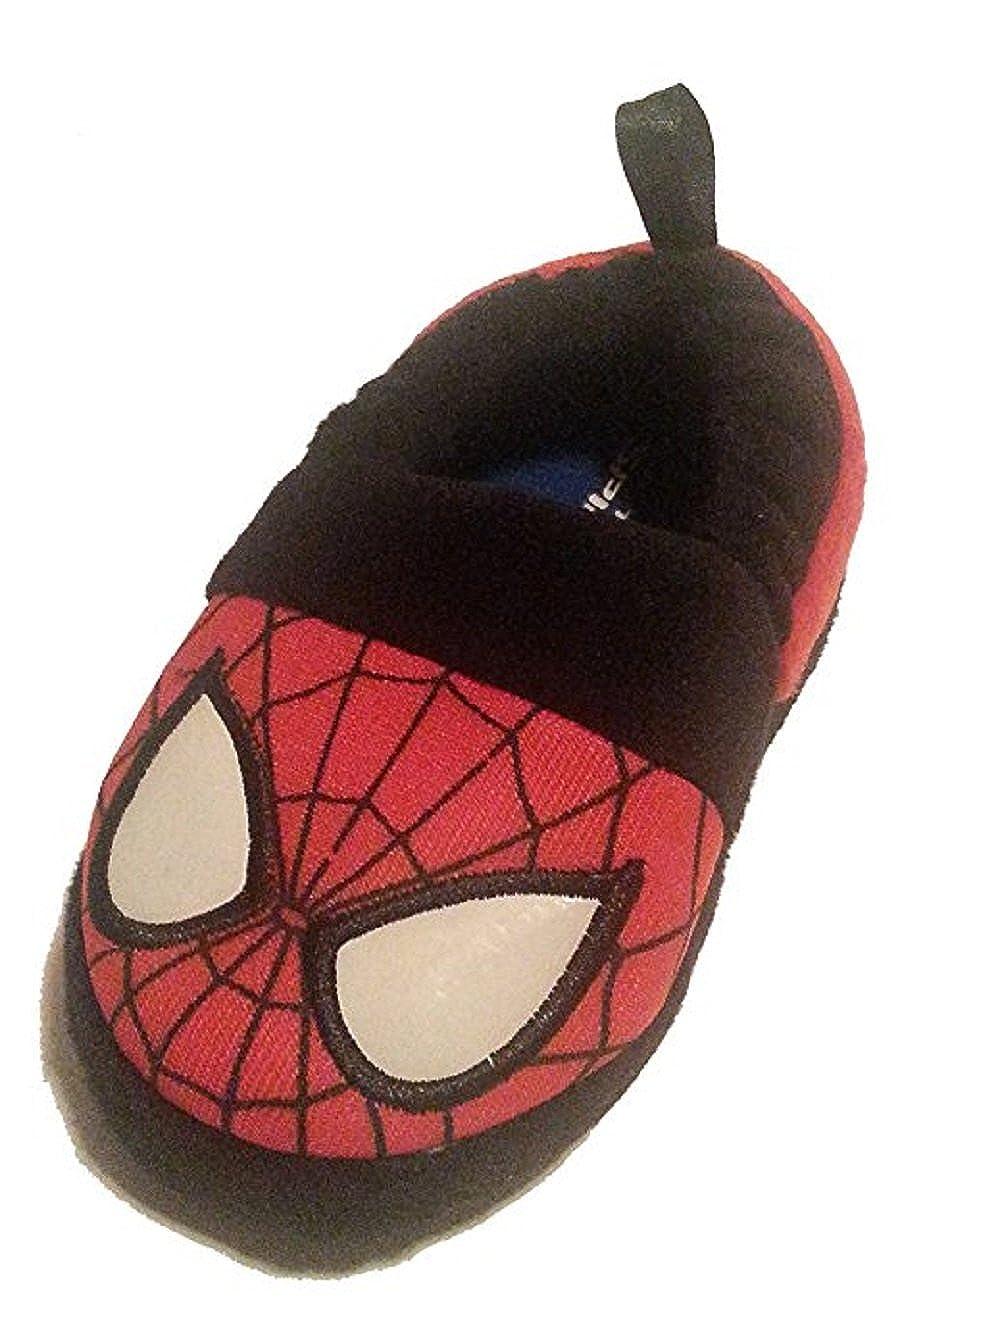 Marvel Spiderman Glow in The Dark Toddler Slippers